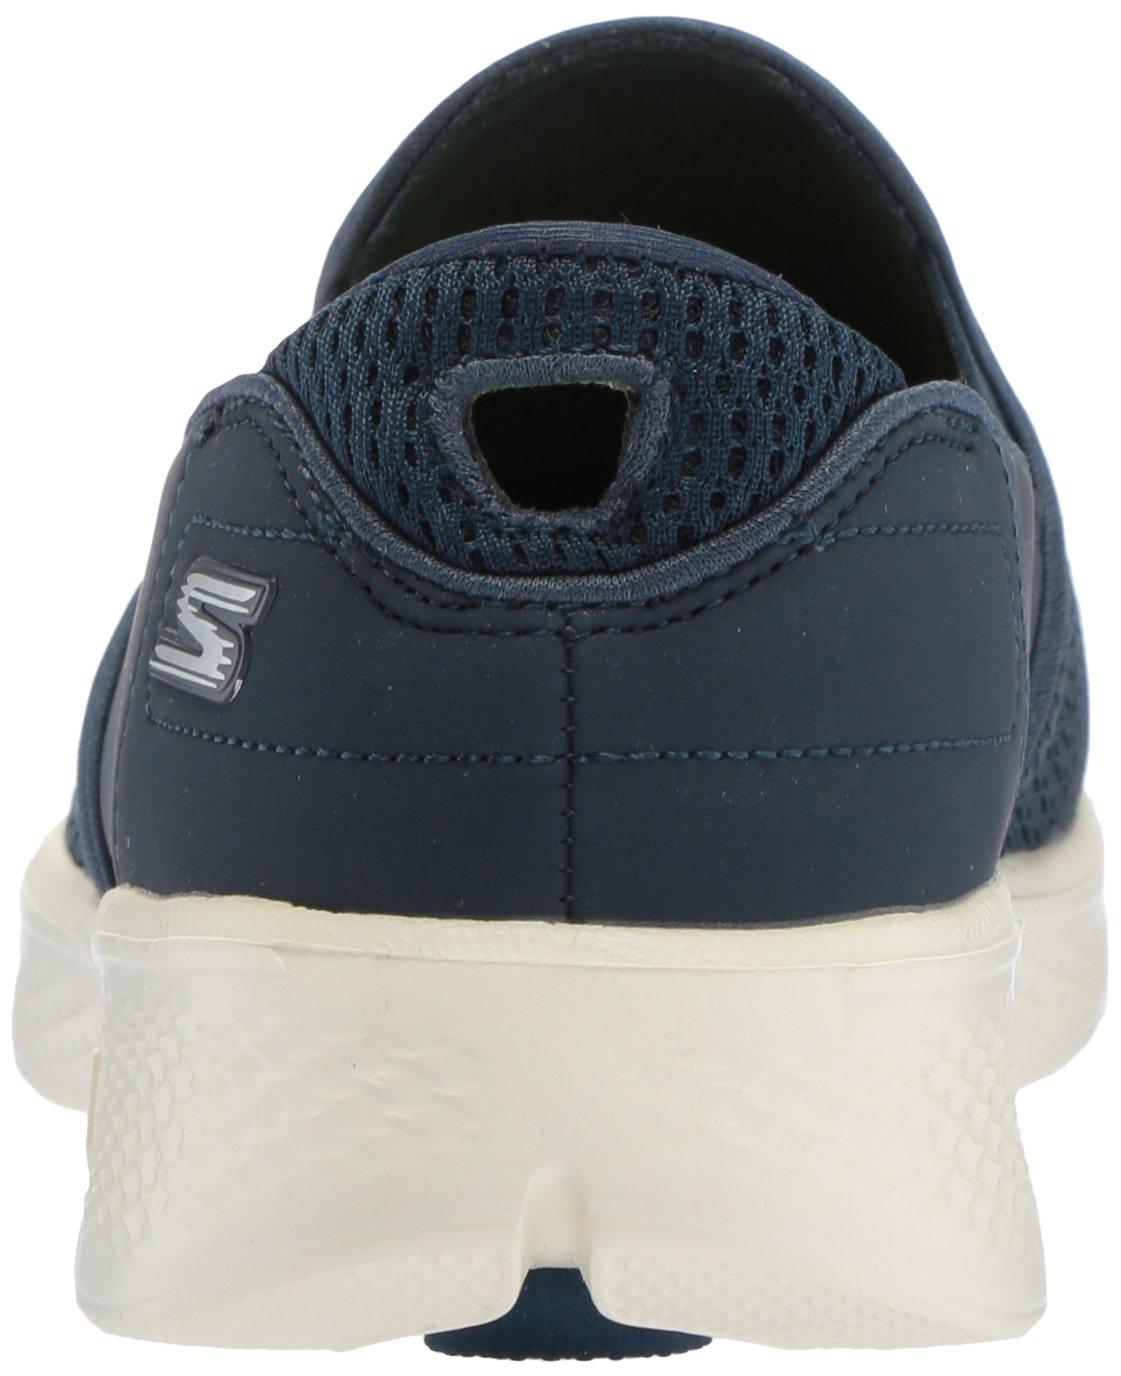 Skechers Women's Go Walk 4-Attuned Sneaker B073GC6XZP 6.5 B(M) US|Navy